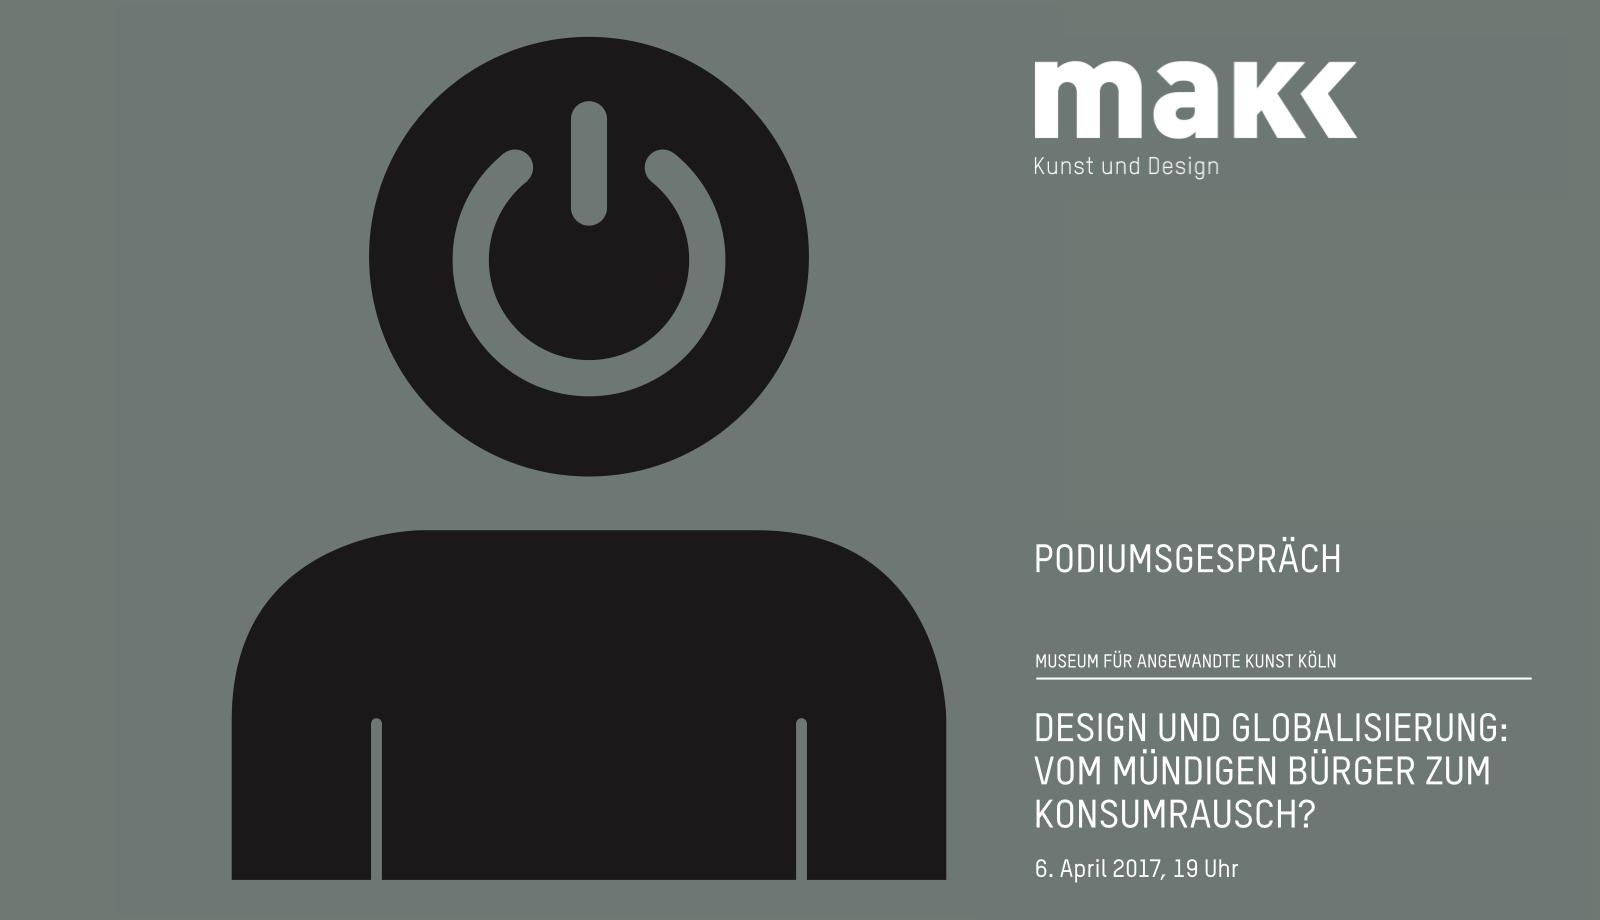 170406_Designkritik_ReneSpitz_MAKK_DesignGlobalisierung